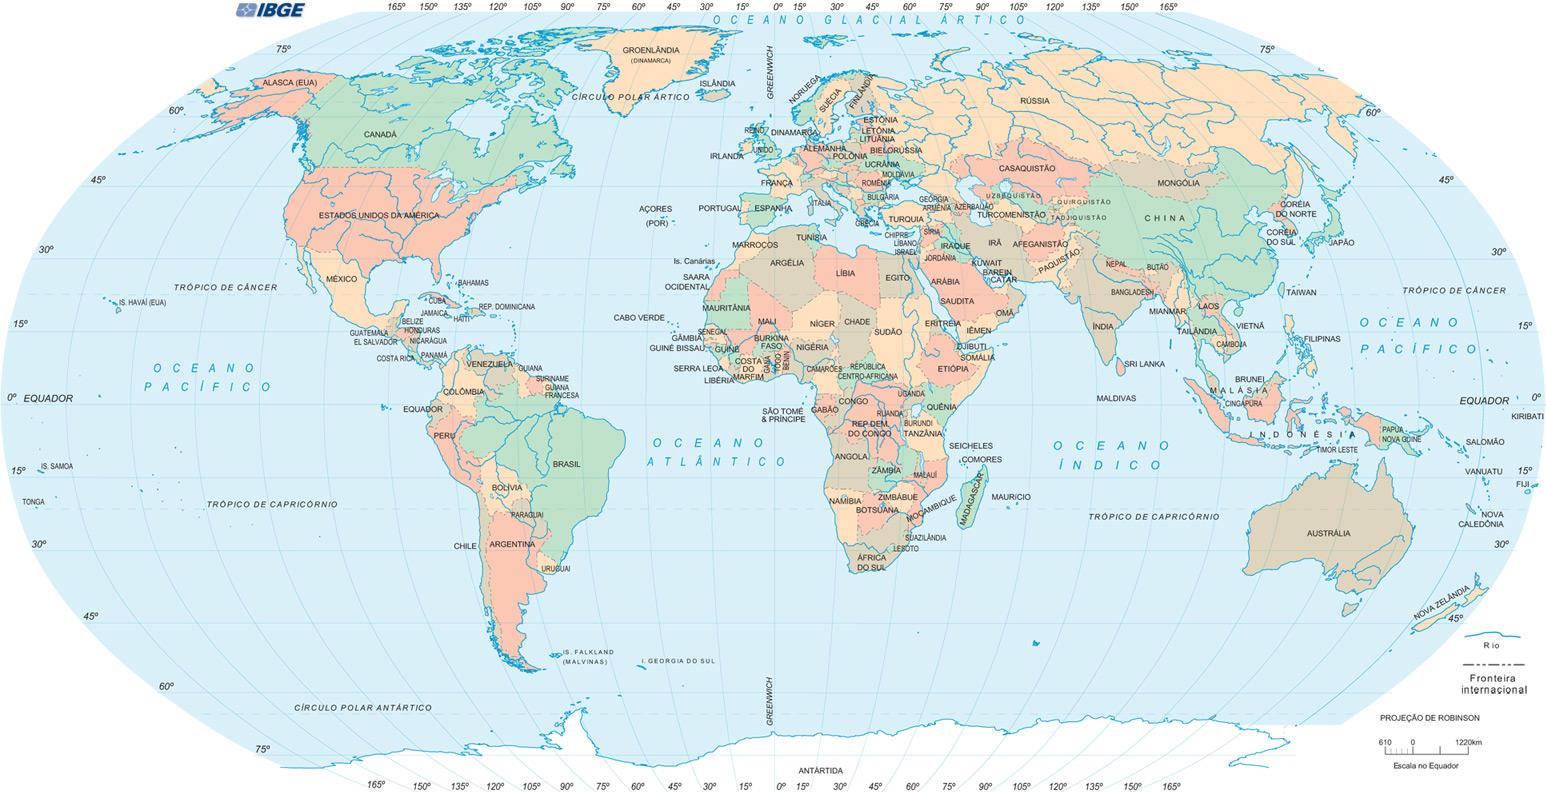 La cara oculta del sol i el c dice voynich for Mapa del mundo decoracion